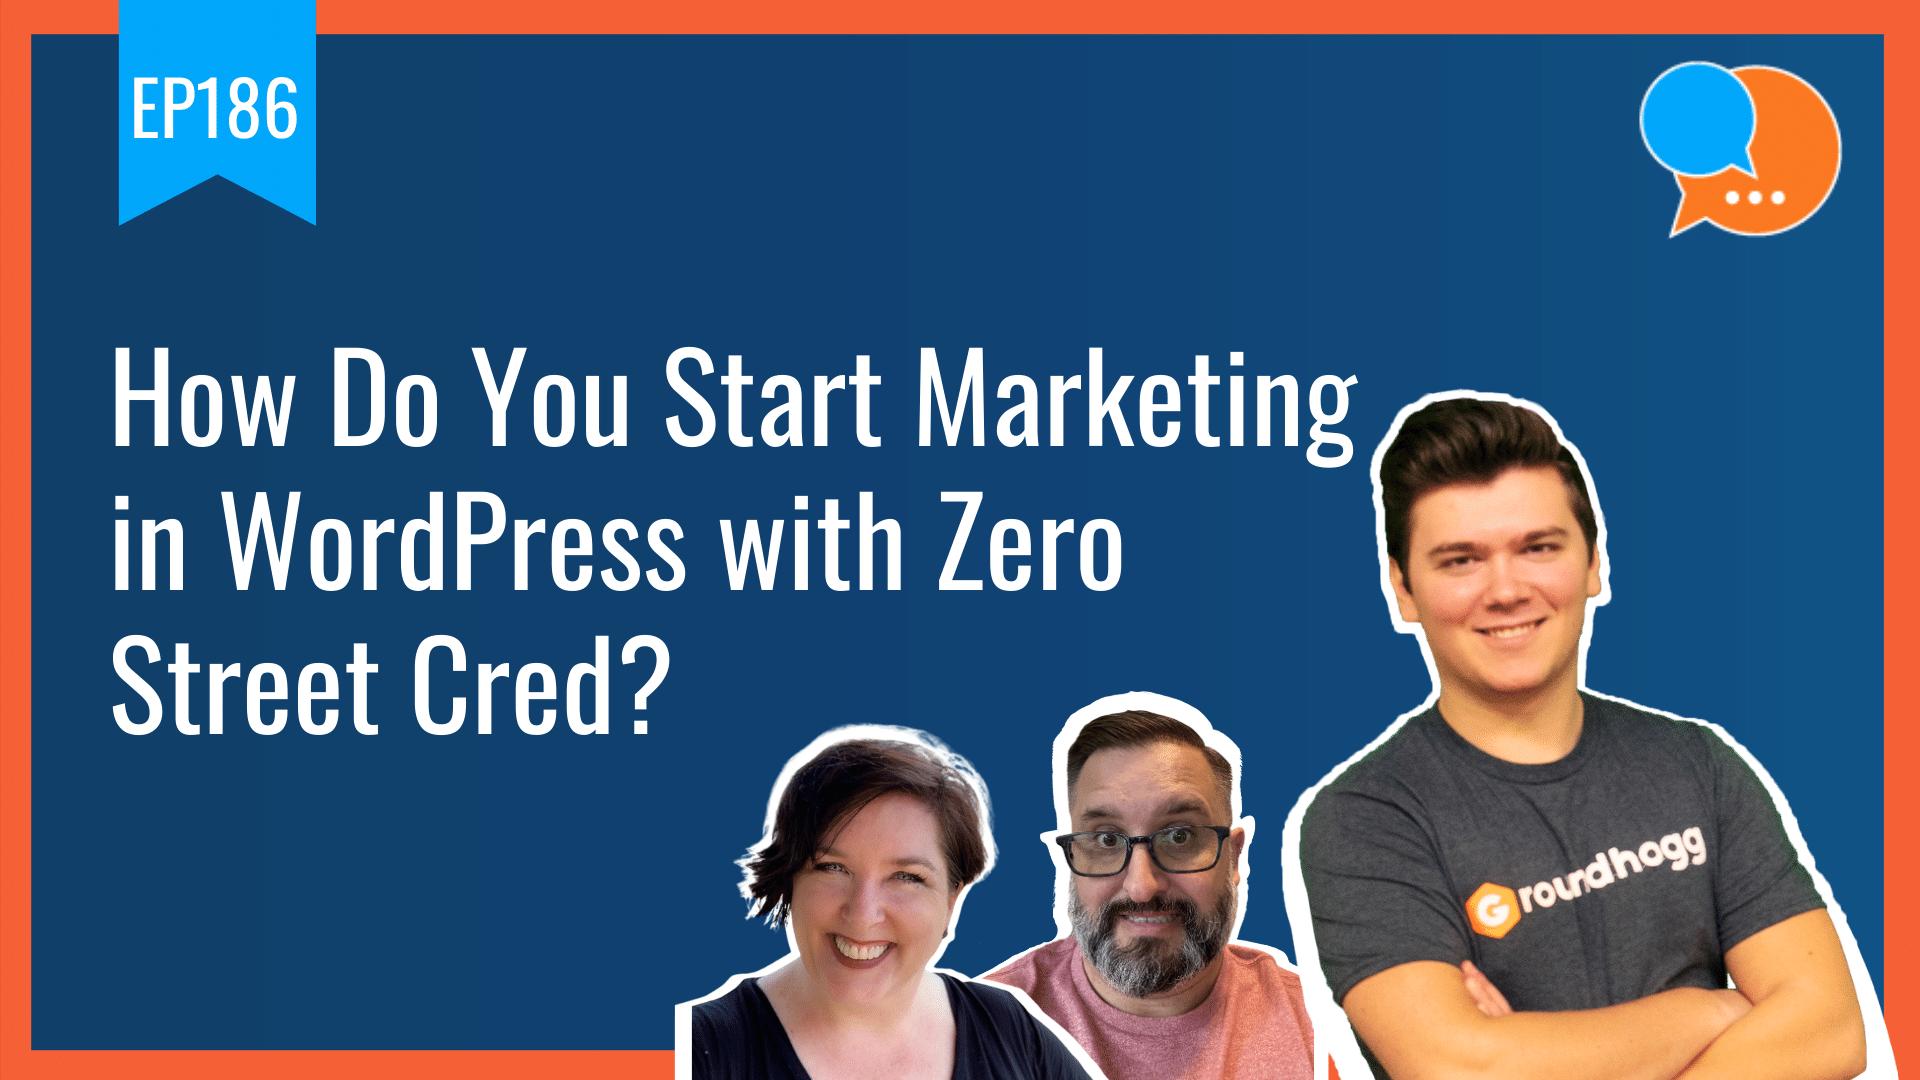 EP186 How Do You Start Marketing in WordPress with Zero Street Cred Smart Marketing Show yt